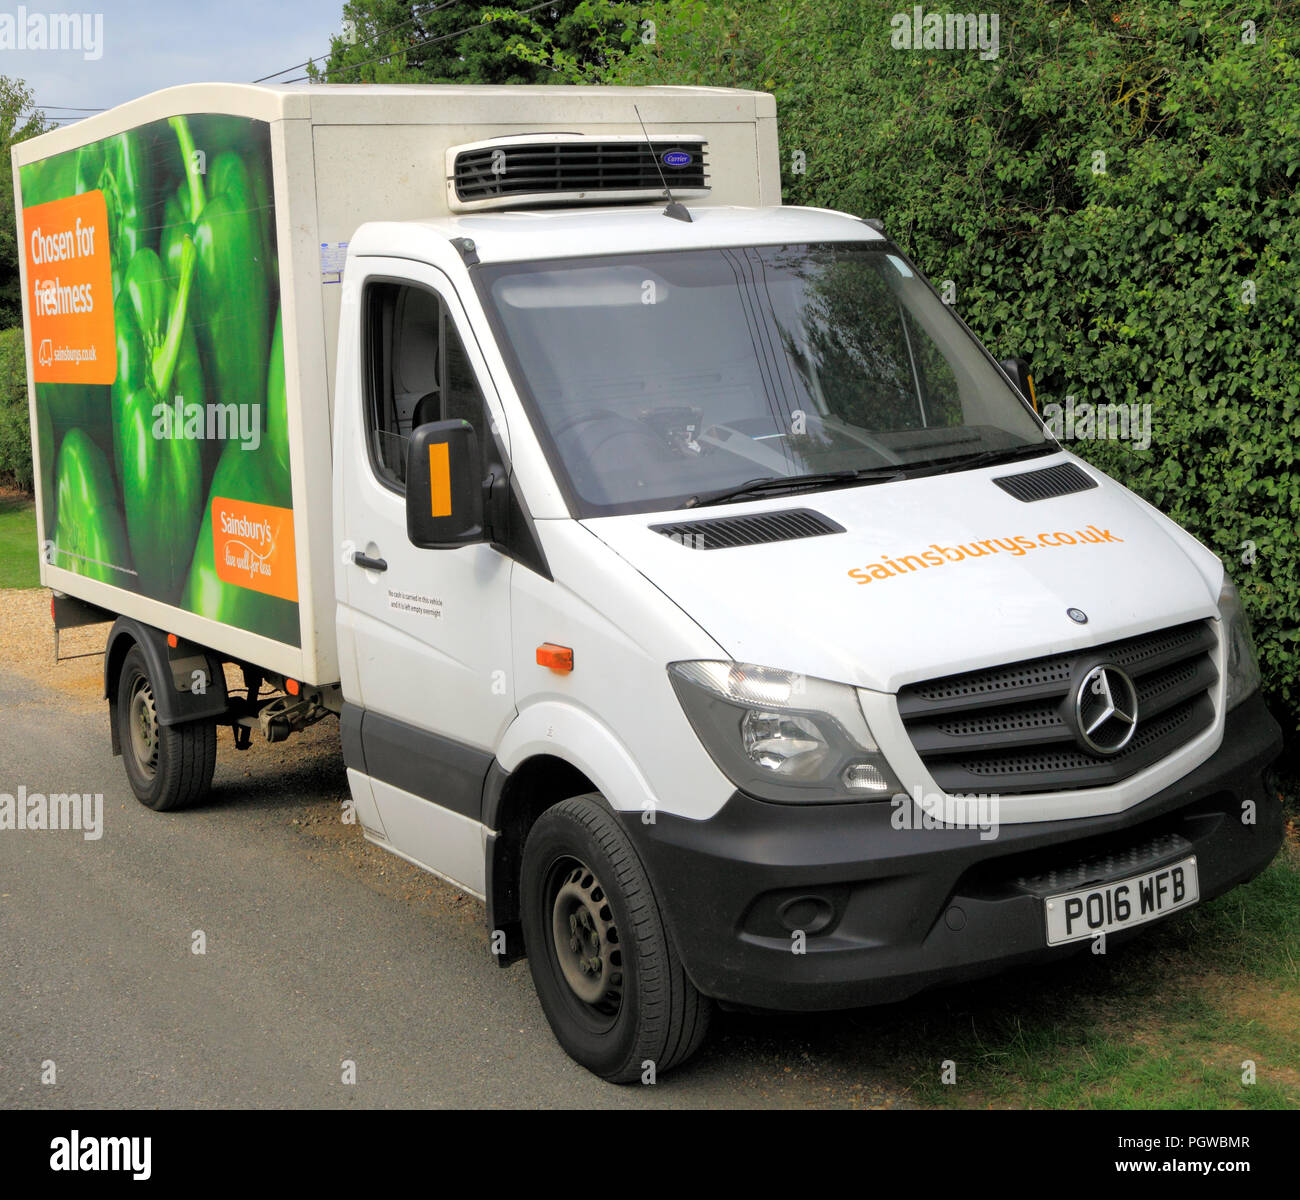 Sainsbury's Supermarket, online delivery, vehicle, van, England, UK, Sainsburys - Stock Image